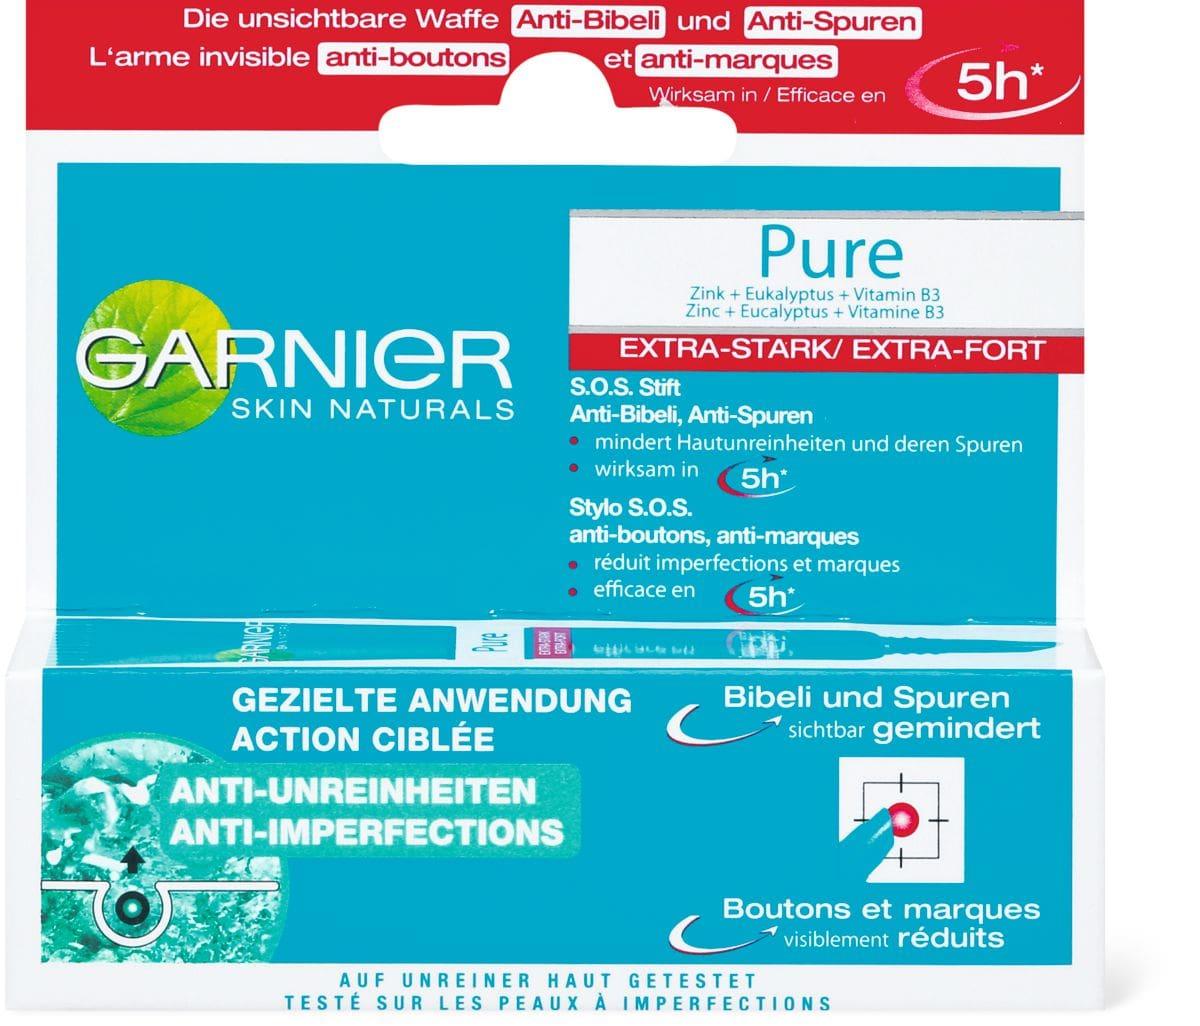 Garnier Pure Stylo SOS anti-bouton